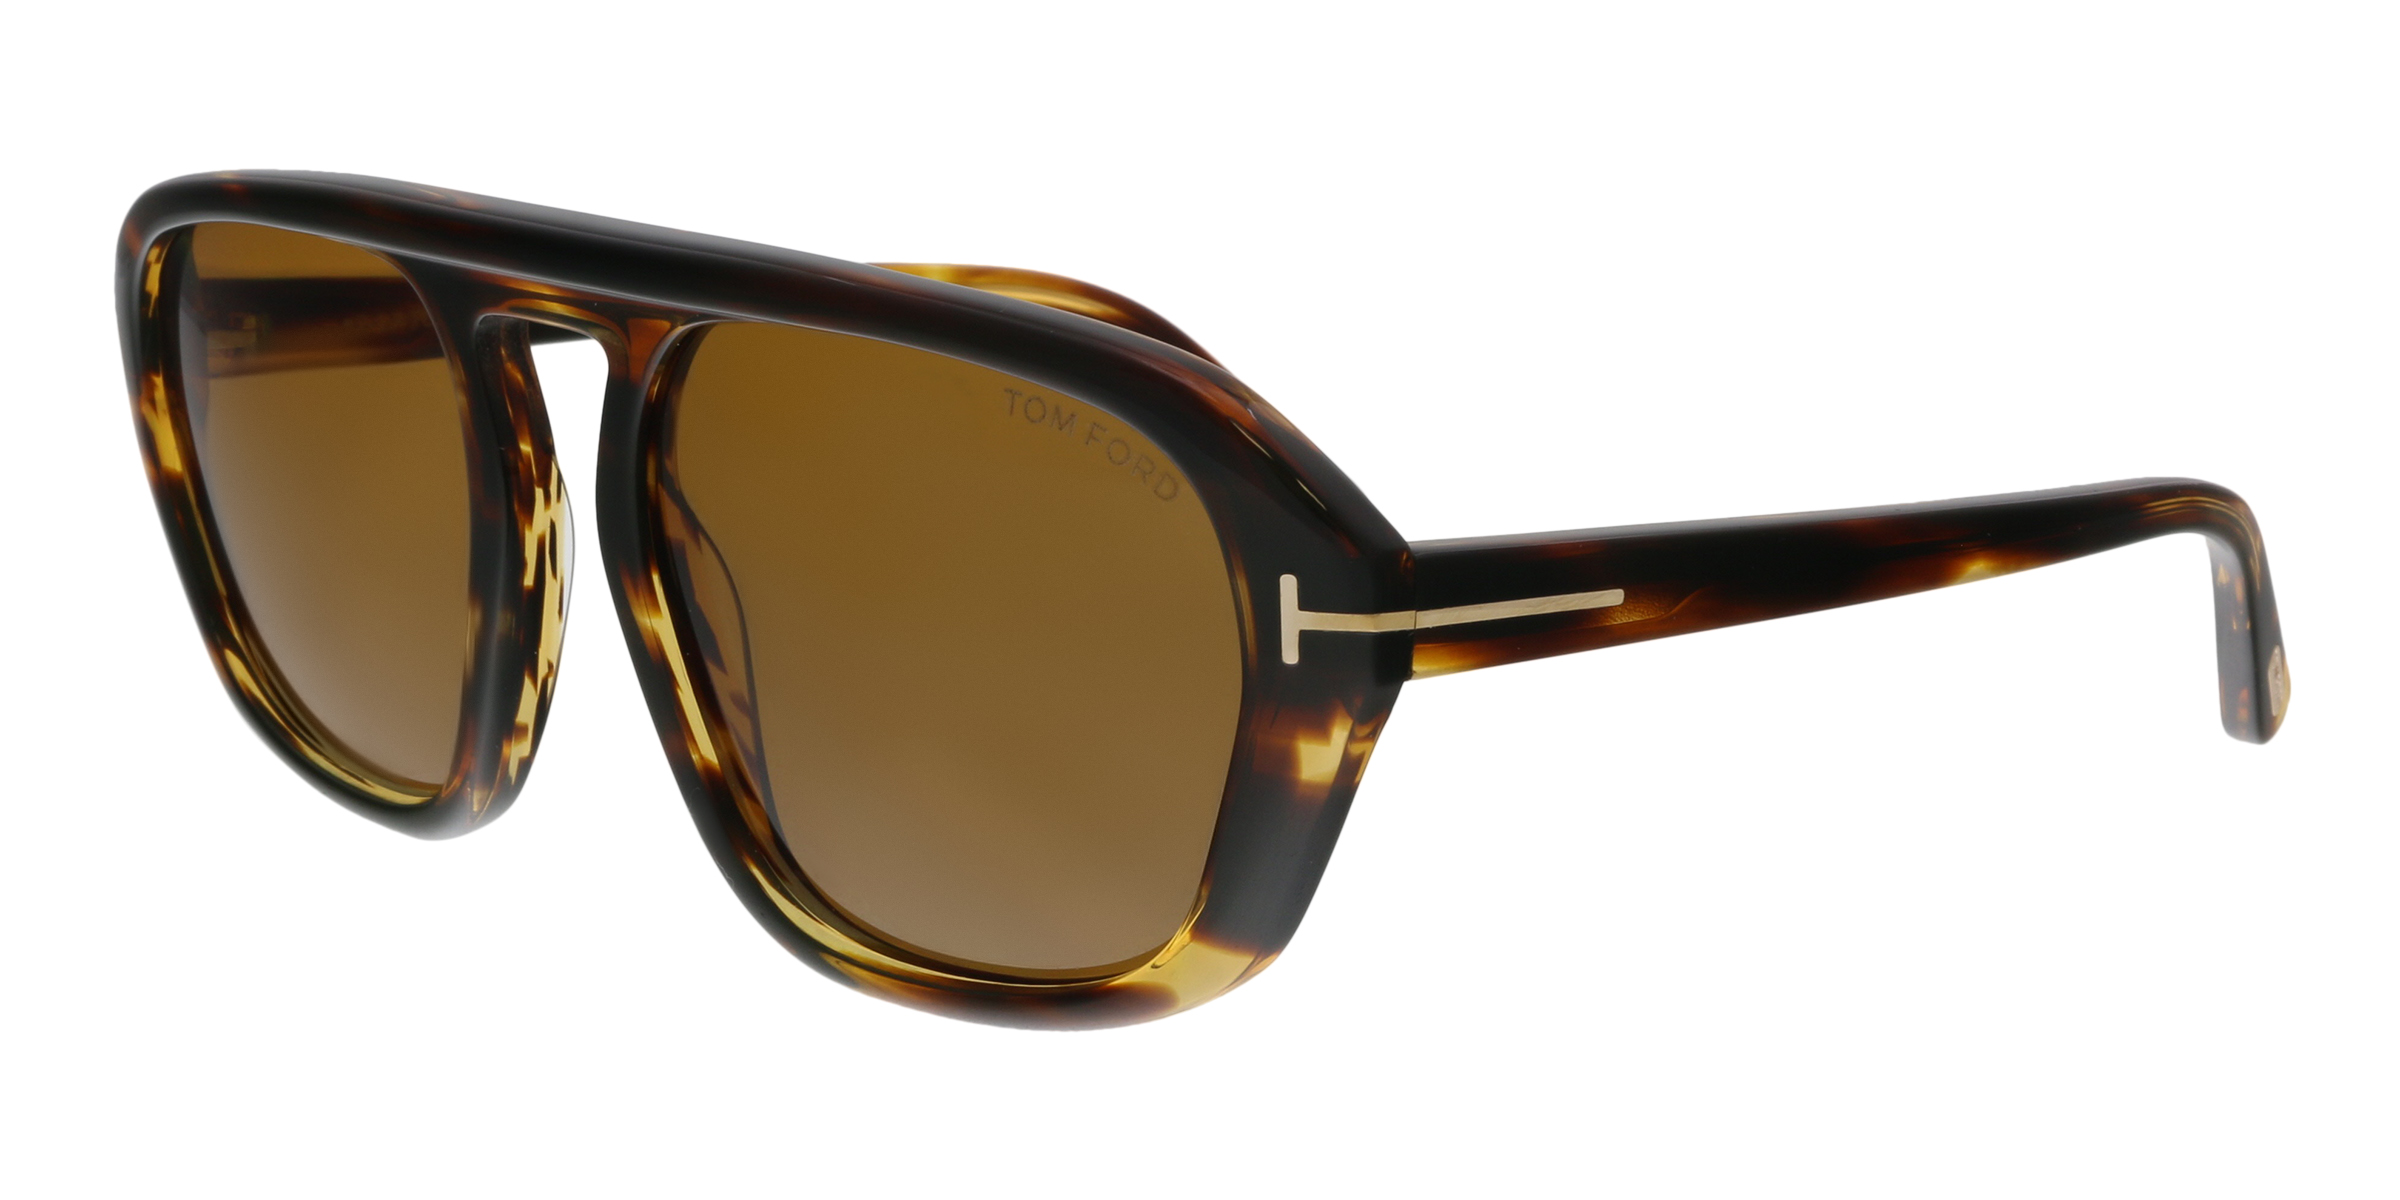 a2819d8be6ddc Tom Ford FT0634 52E David-02 Havana Square Sunglasses 664689926824 ...